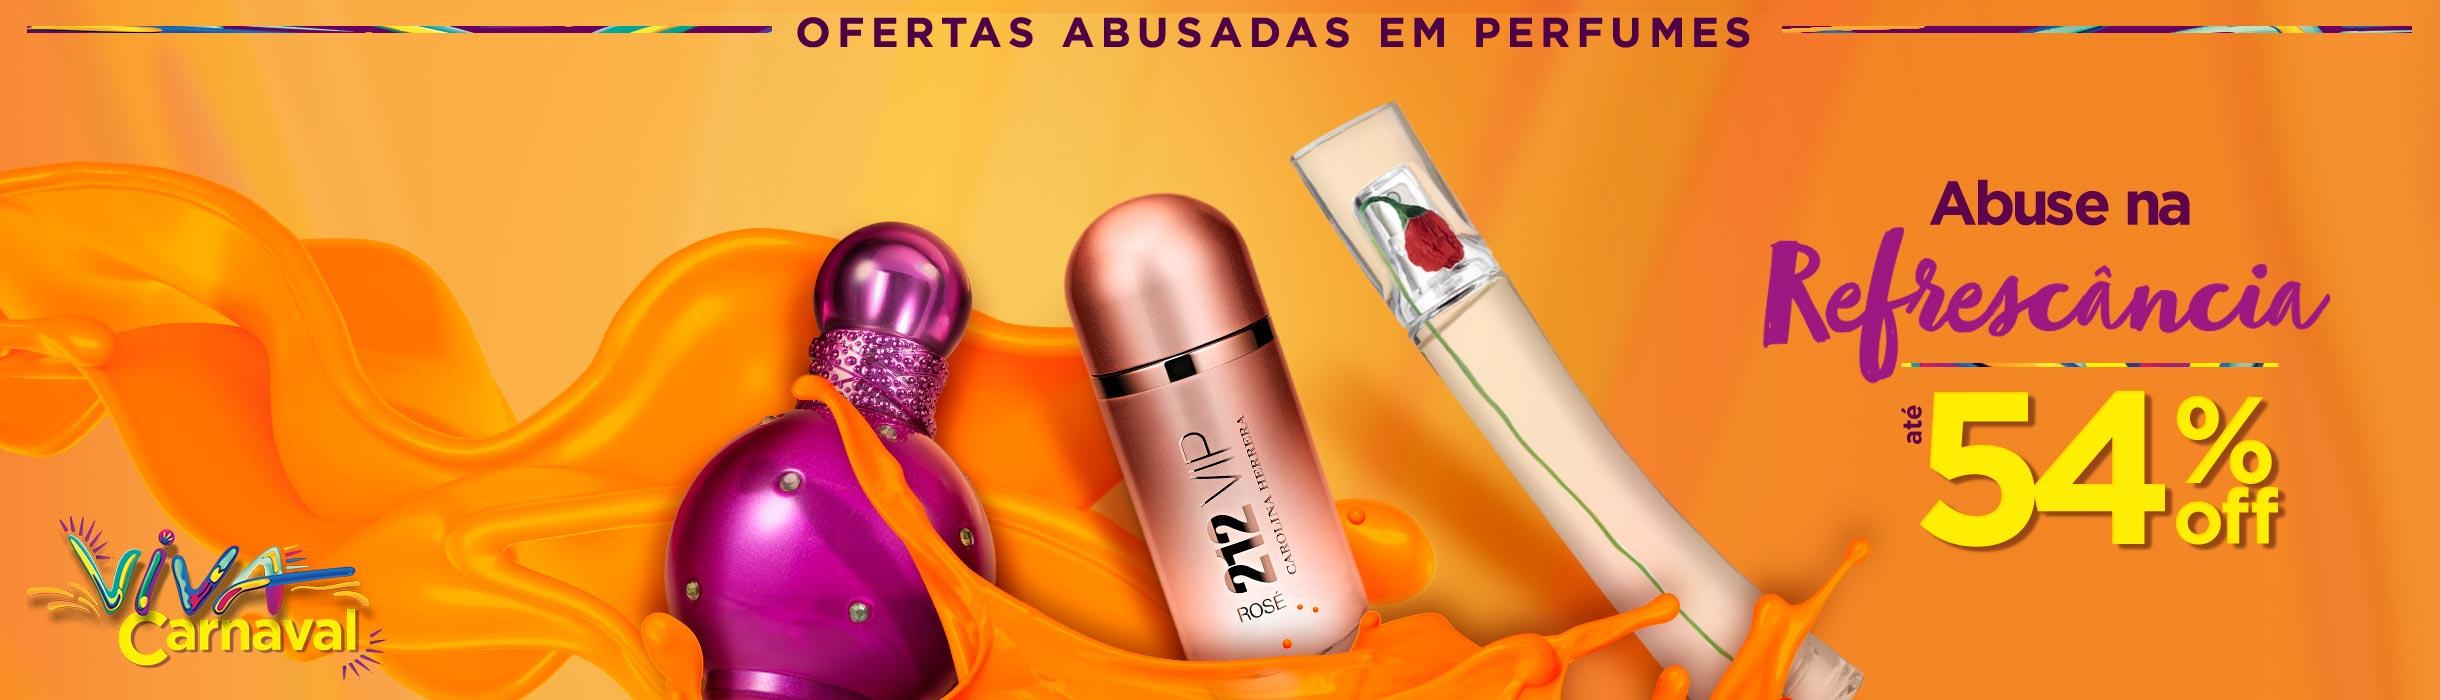 Perfumes para Carnaval